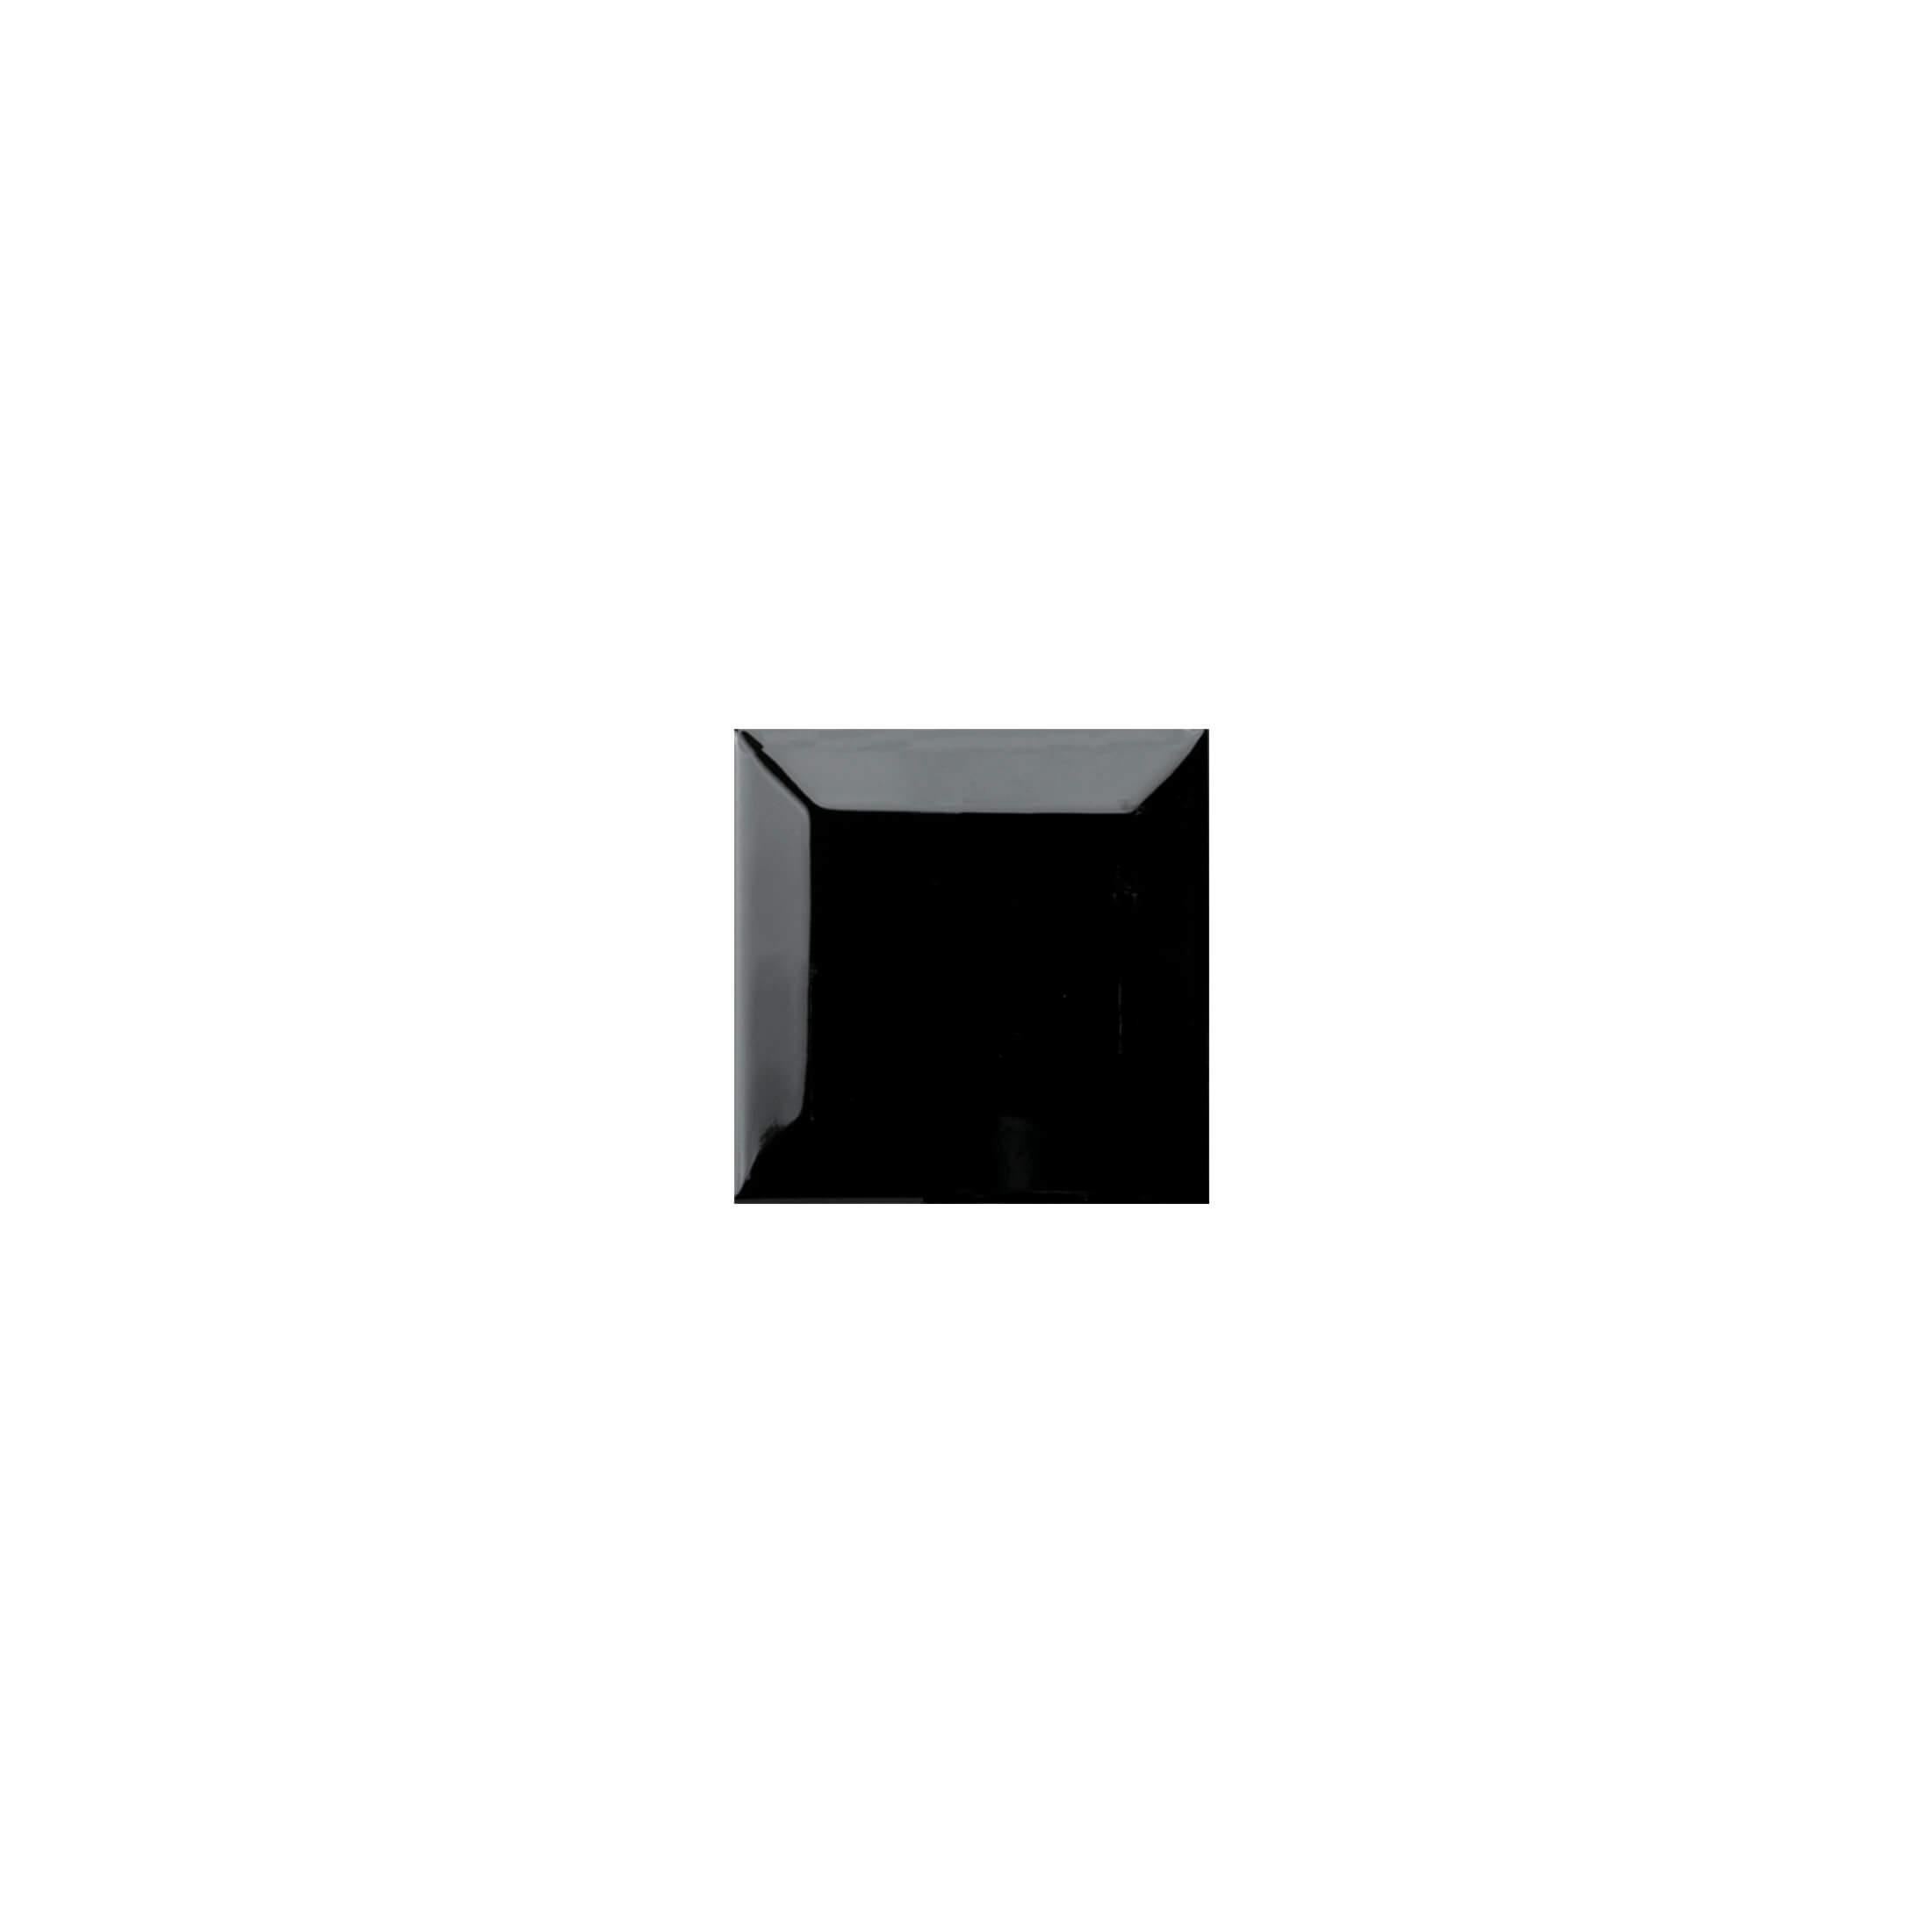 ADNE2048 - BISELADO PB - 7.5 cm X 7.5 cm